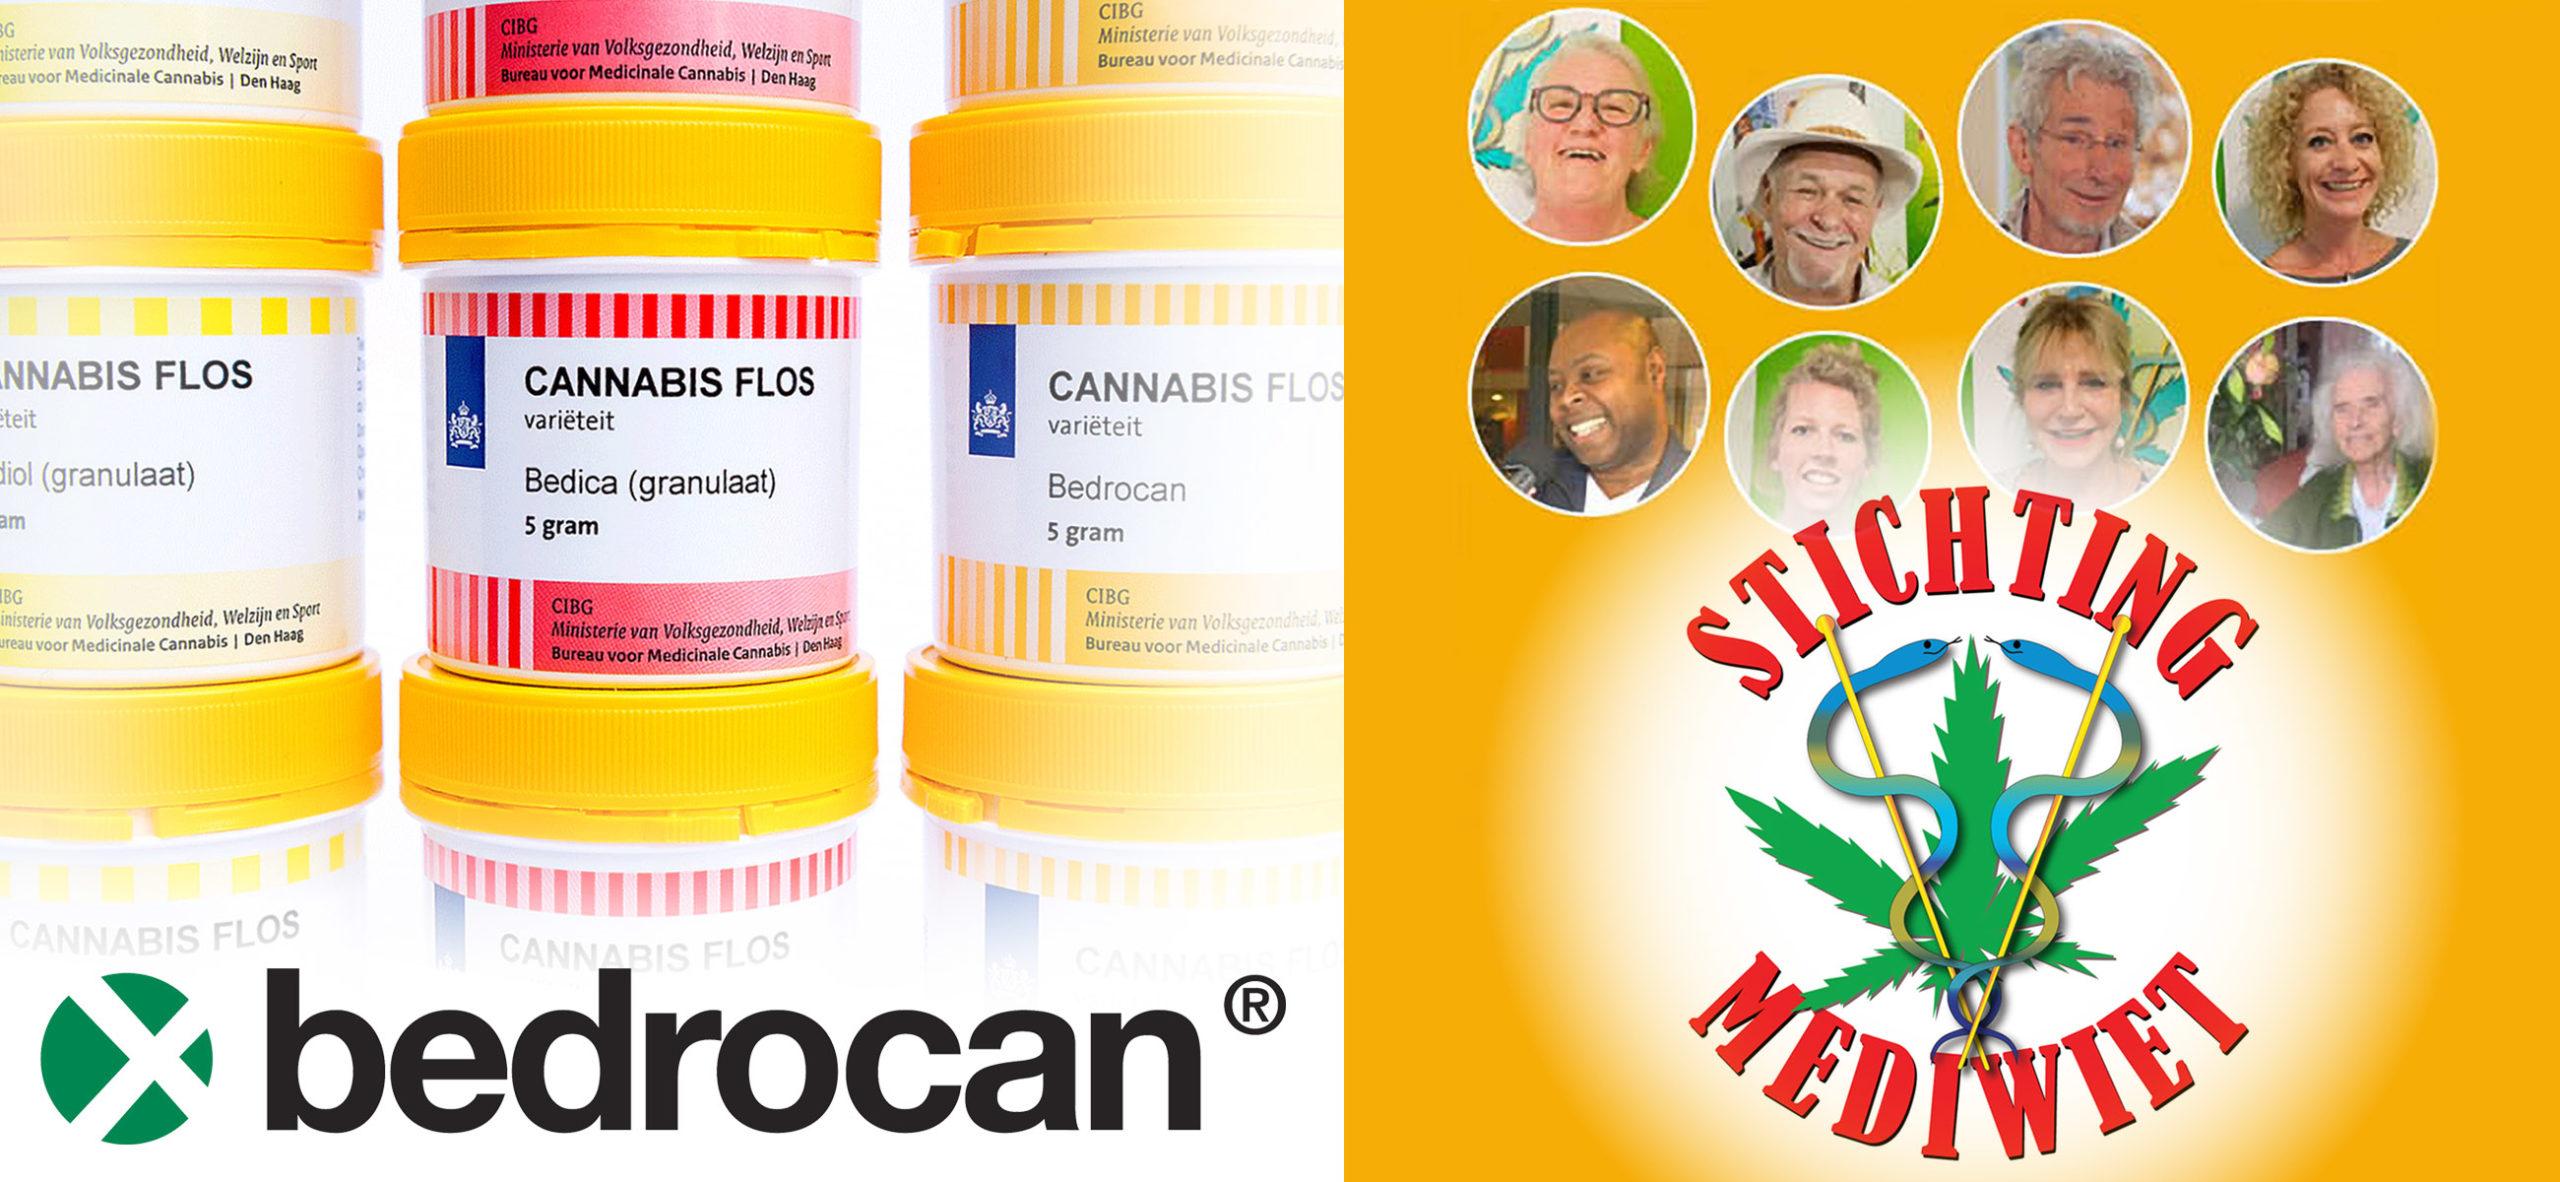 Pots de cannabis thérapeutique NL Bedrocan; membres de l'association de cannabis thérapeutique NL Stichting Mediwiet.